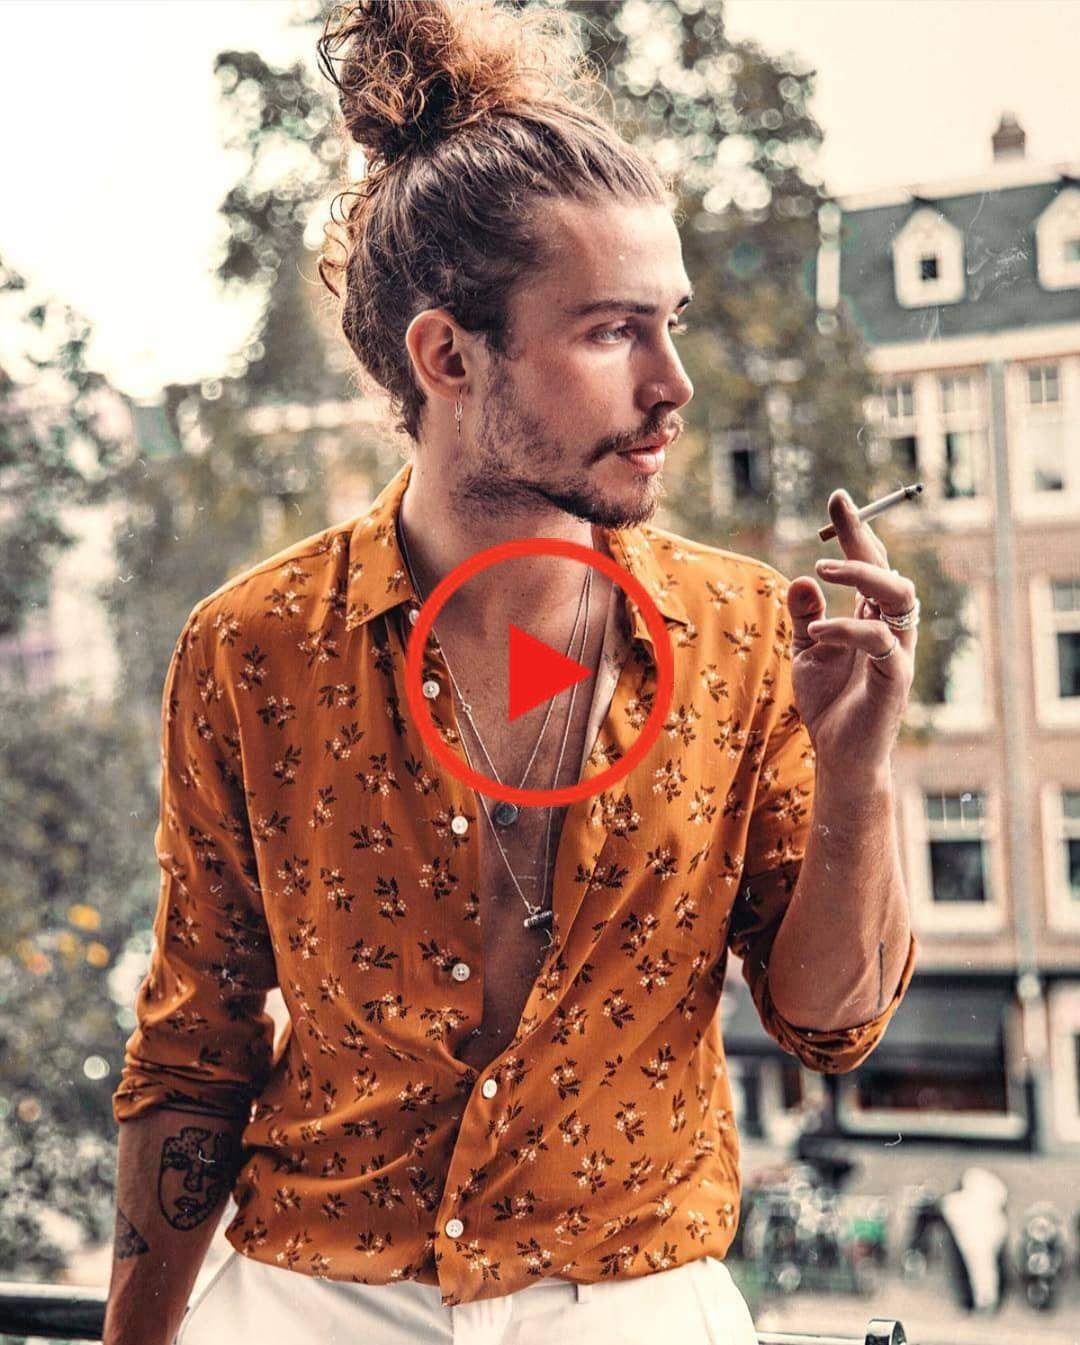 Bet On Male Hairstyle High Bun 2019 In 2020 Boho Style Manner Bohemian Stil Manner Herrenkleidung